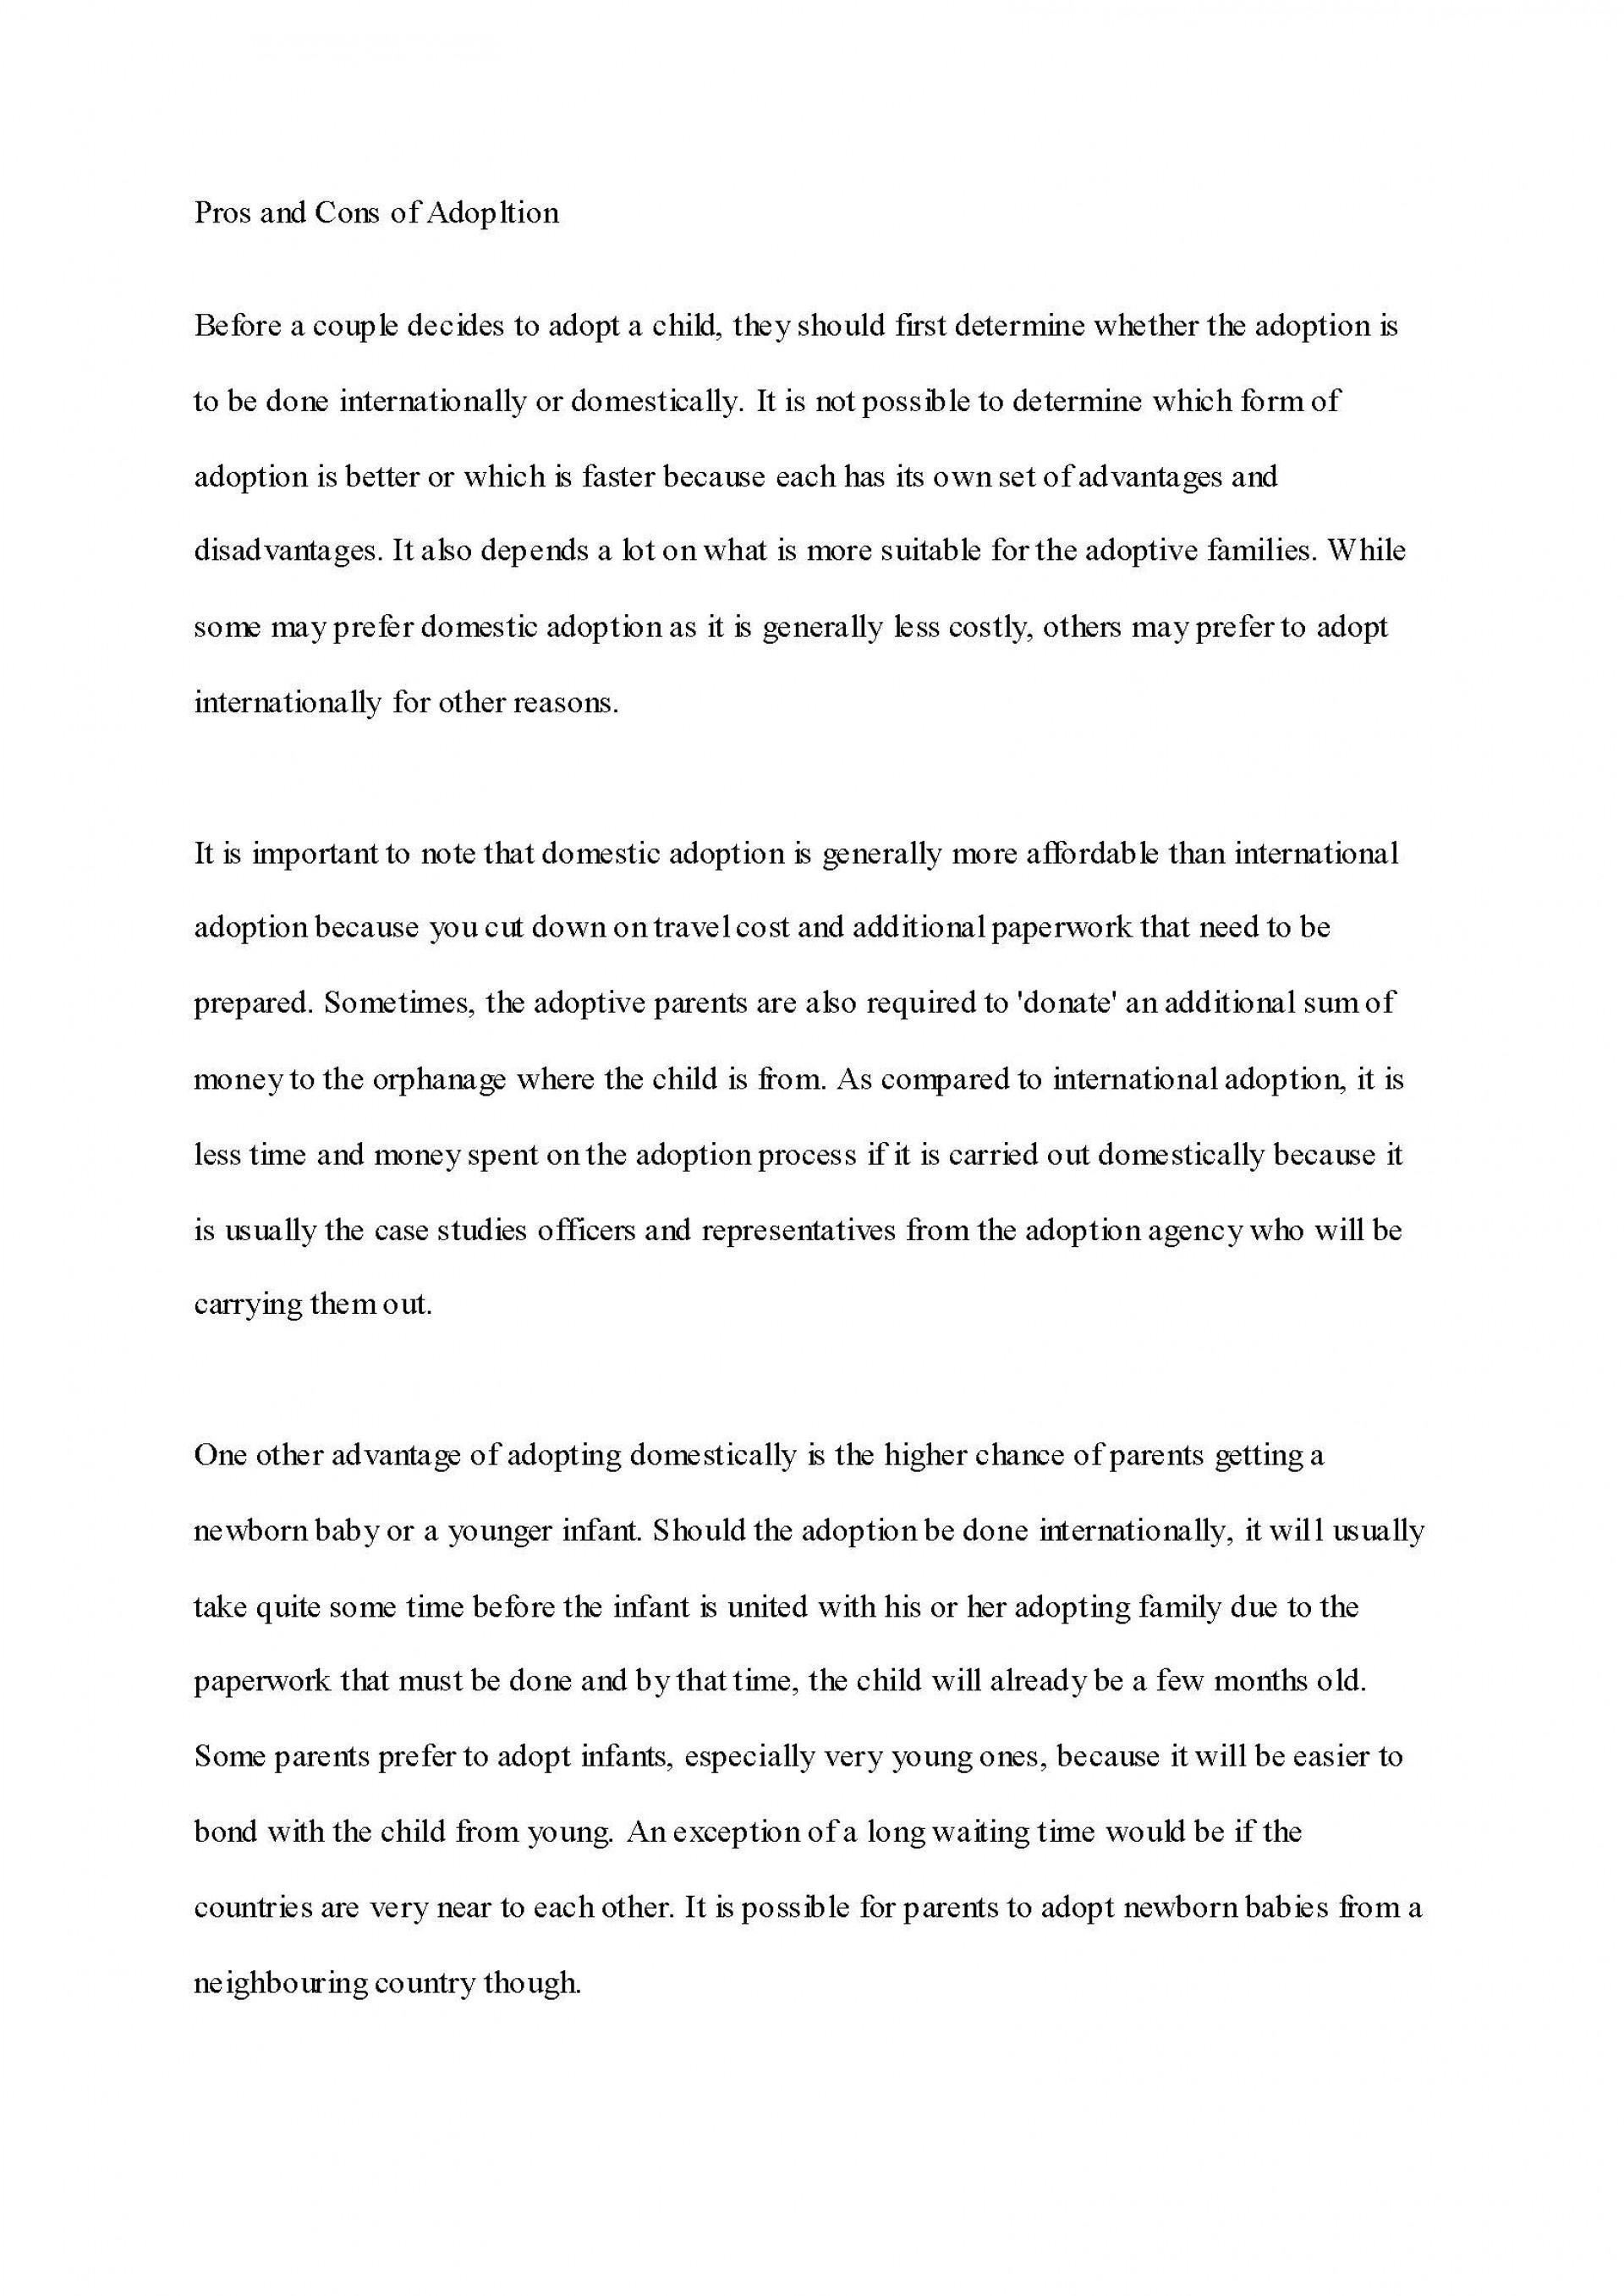 014 Process Essay Outline Adoption Samplecb Fantastic Template Pdf 1920